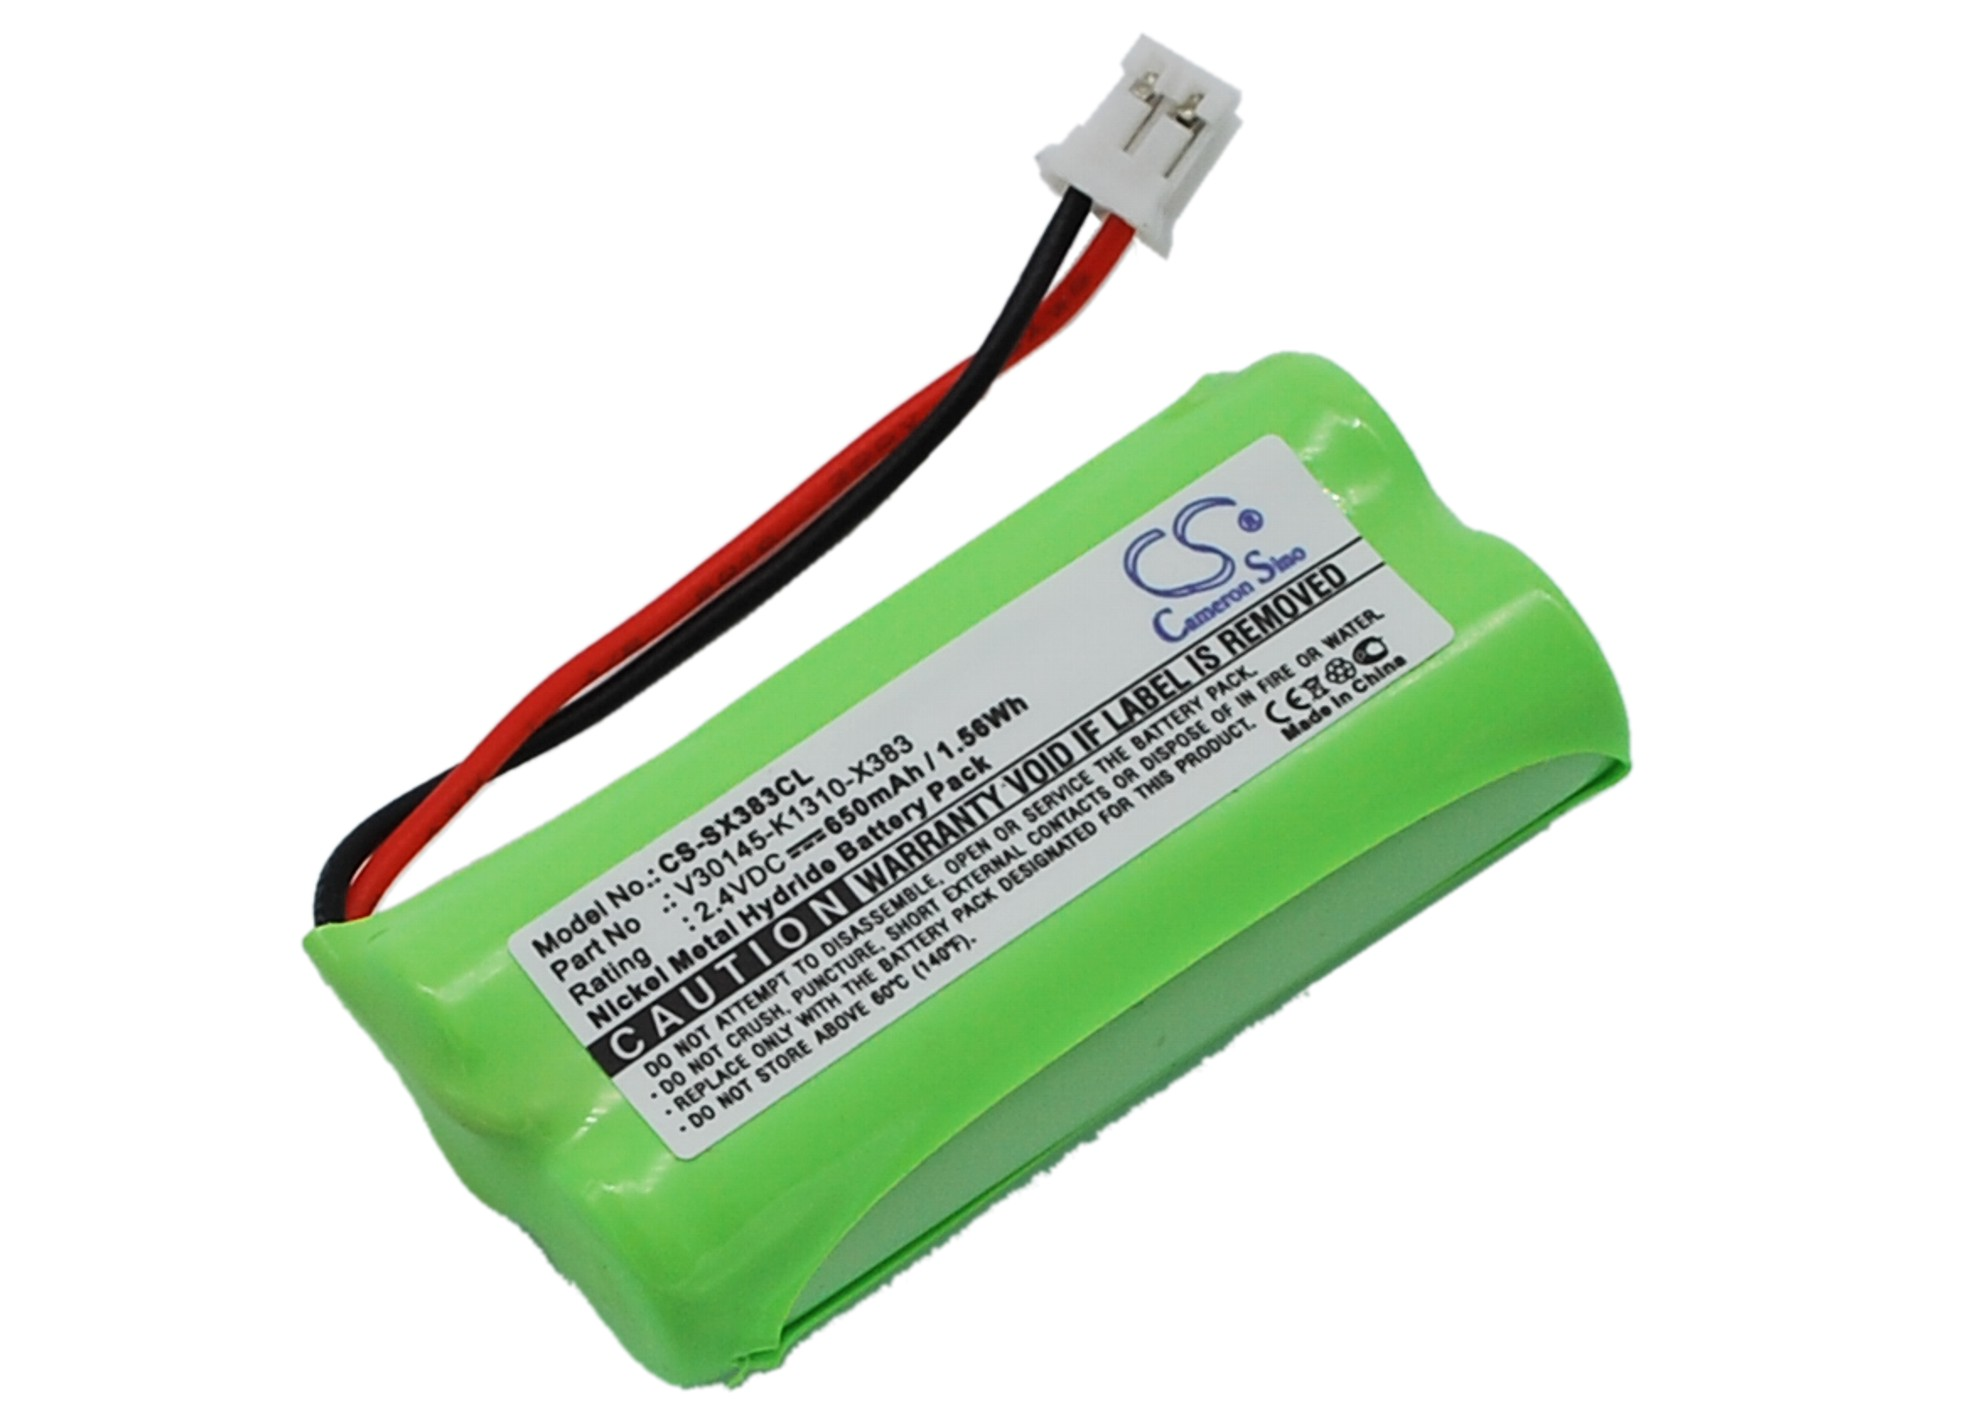 Cameron Sino baterie do bezdrátových telefonů pro SIEMENS Gigaset A140 weib 2.4V Ni-MH 650mAh černá - neoriginální